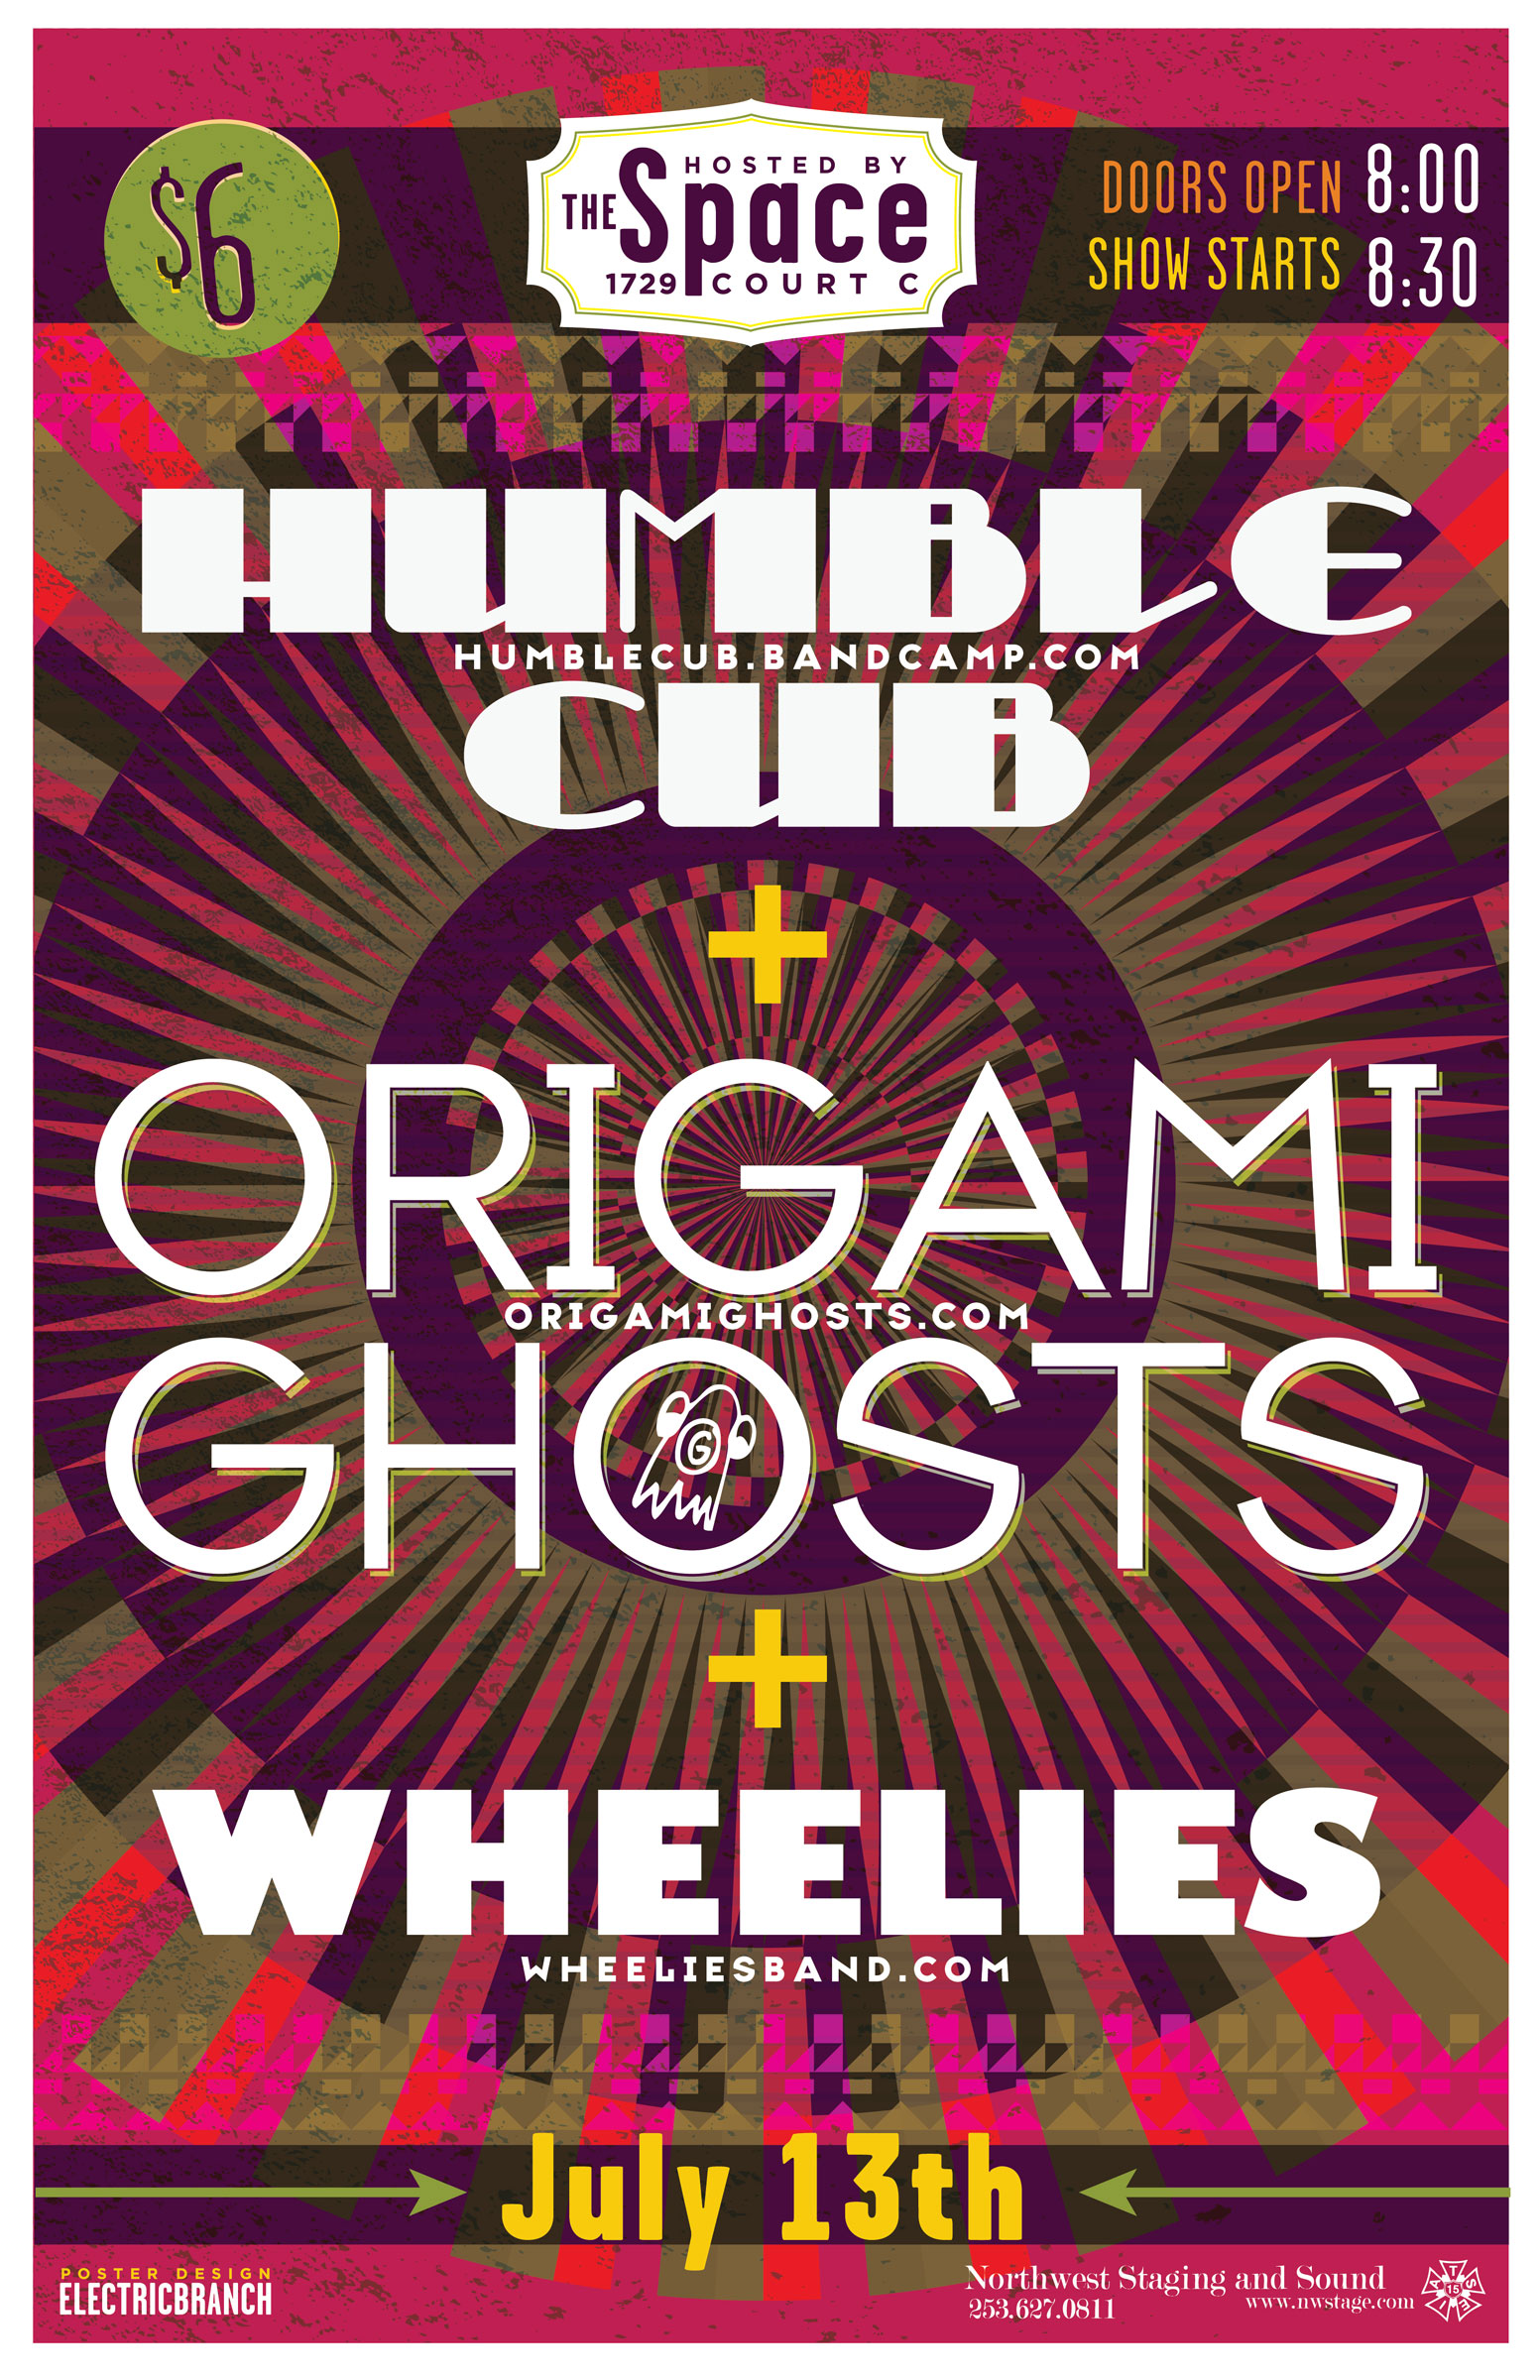 ORIGAMI-GHOSTS_HUMBLE-CUB-6-01.jpg